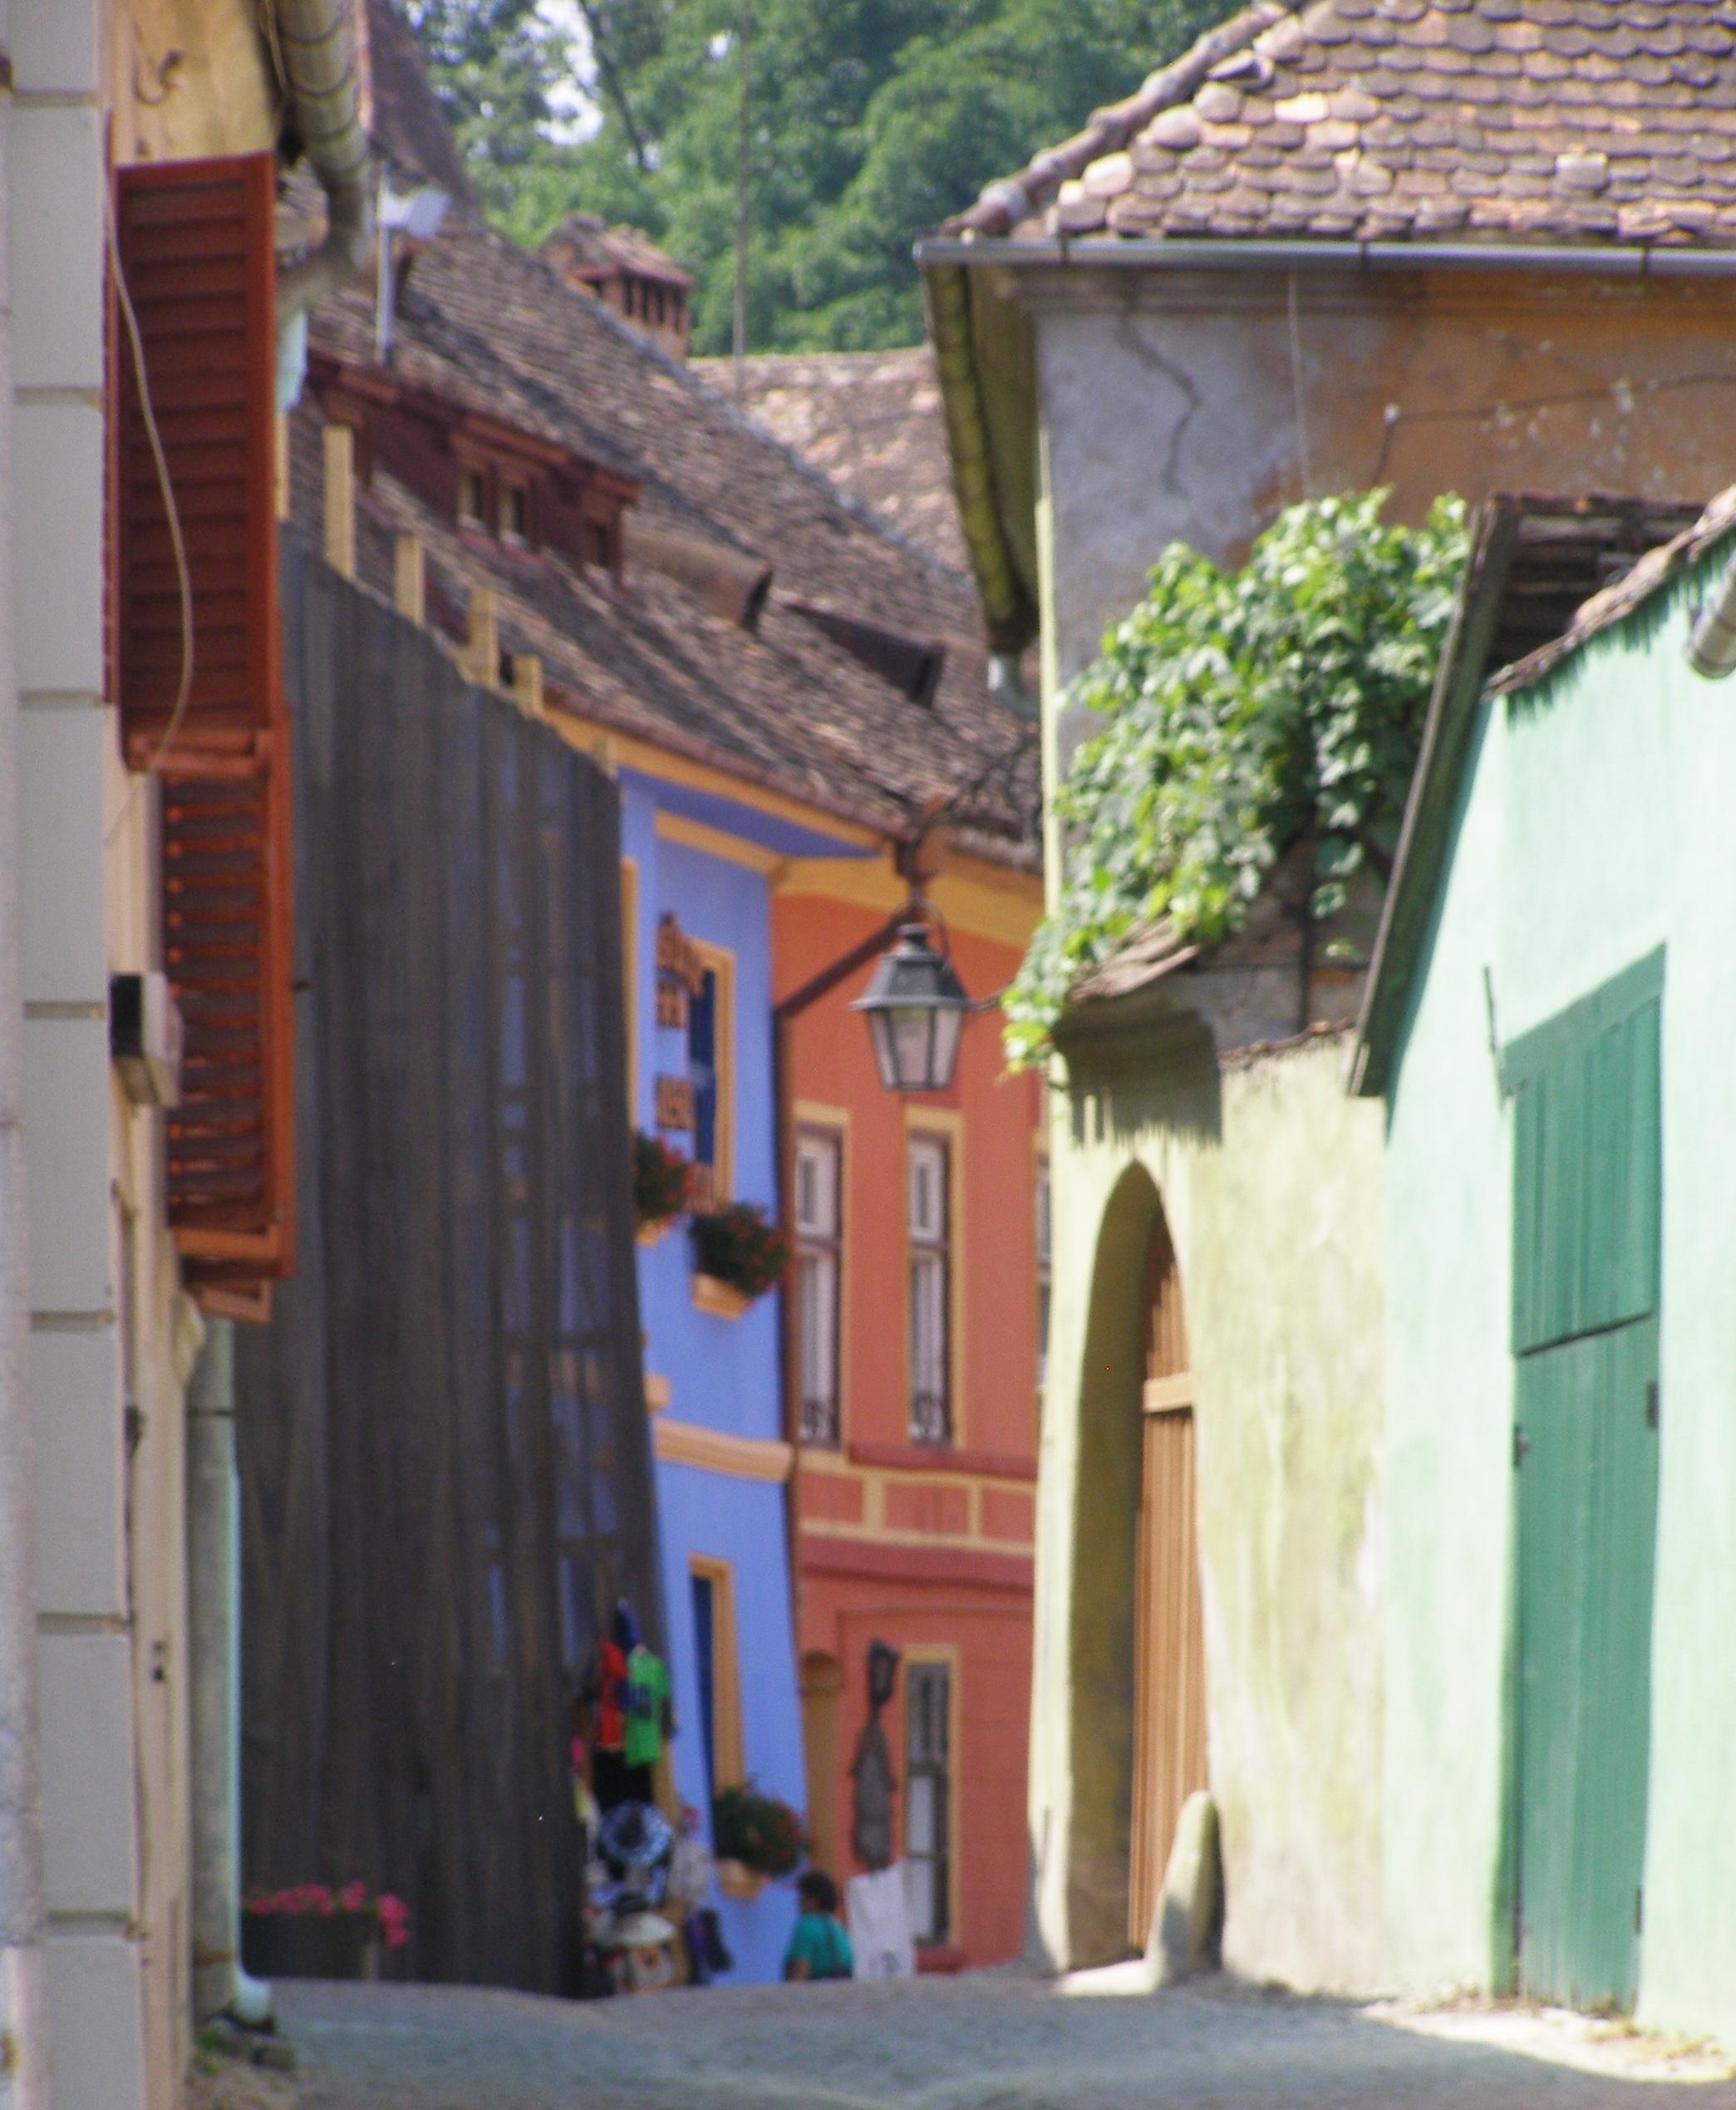 Streets of Sighisoara